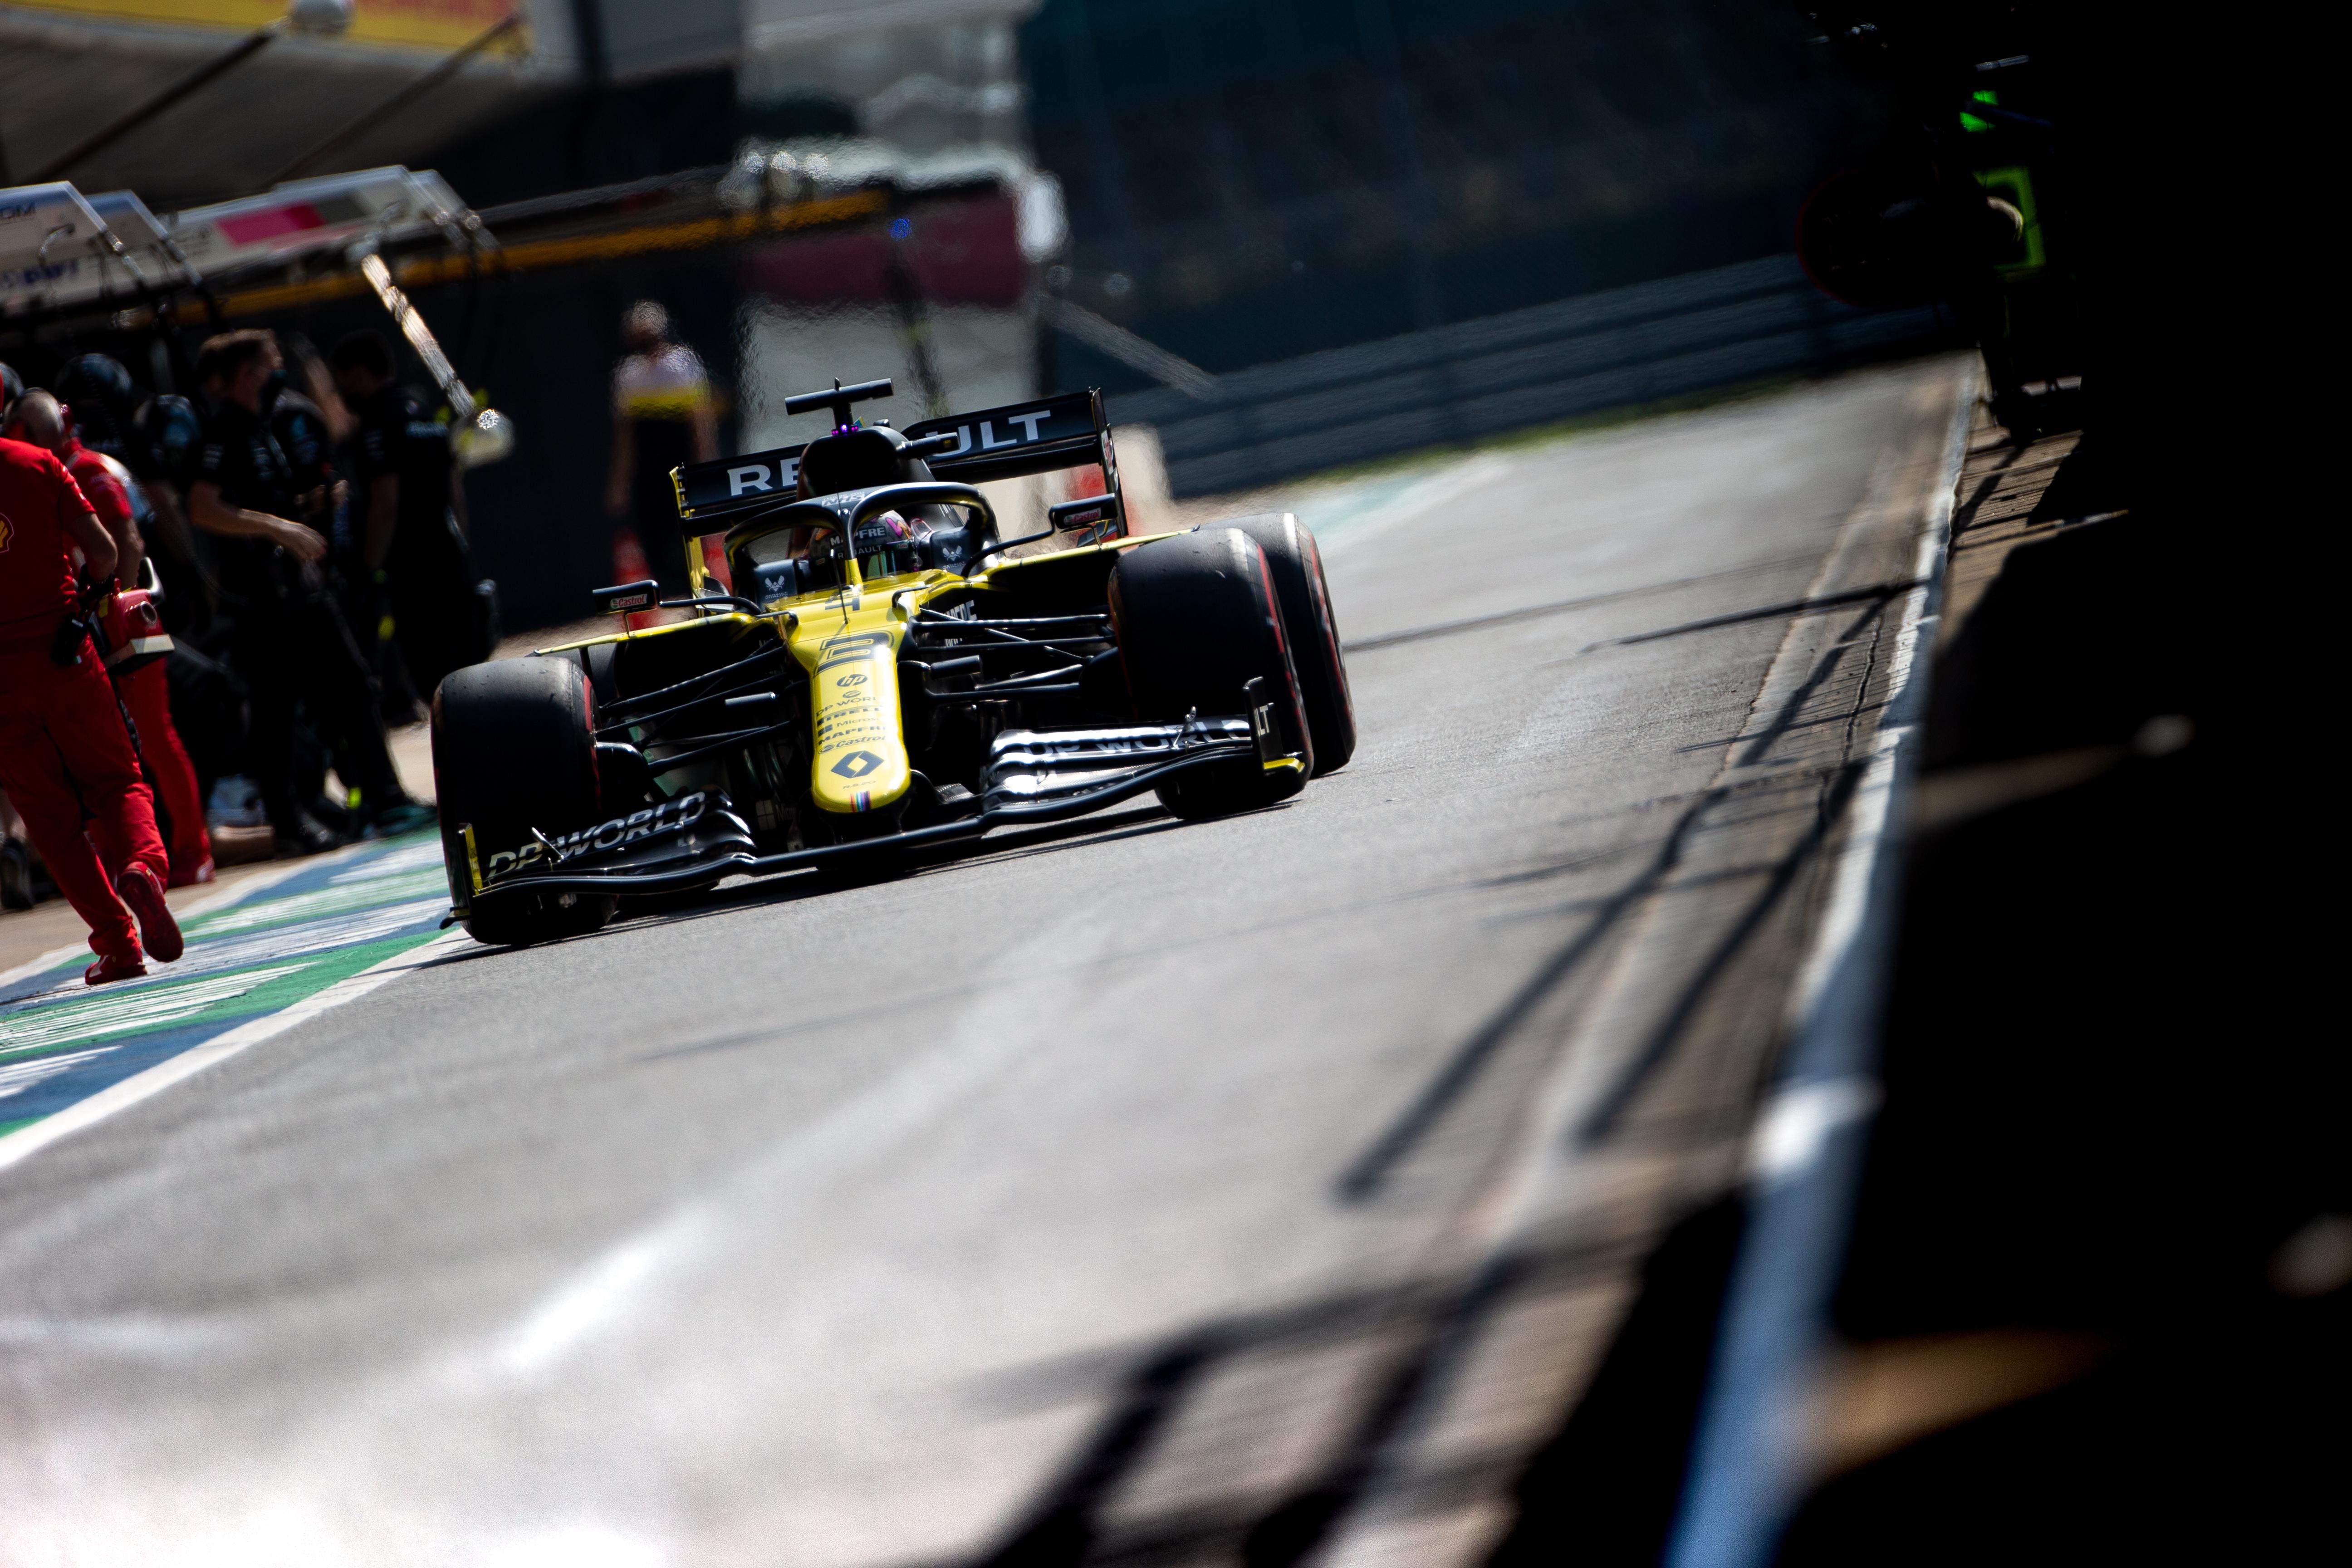 Daniel Ricciardo Renault British Grand Prix practice Silverstone 2020